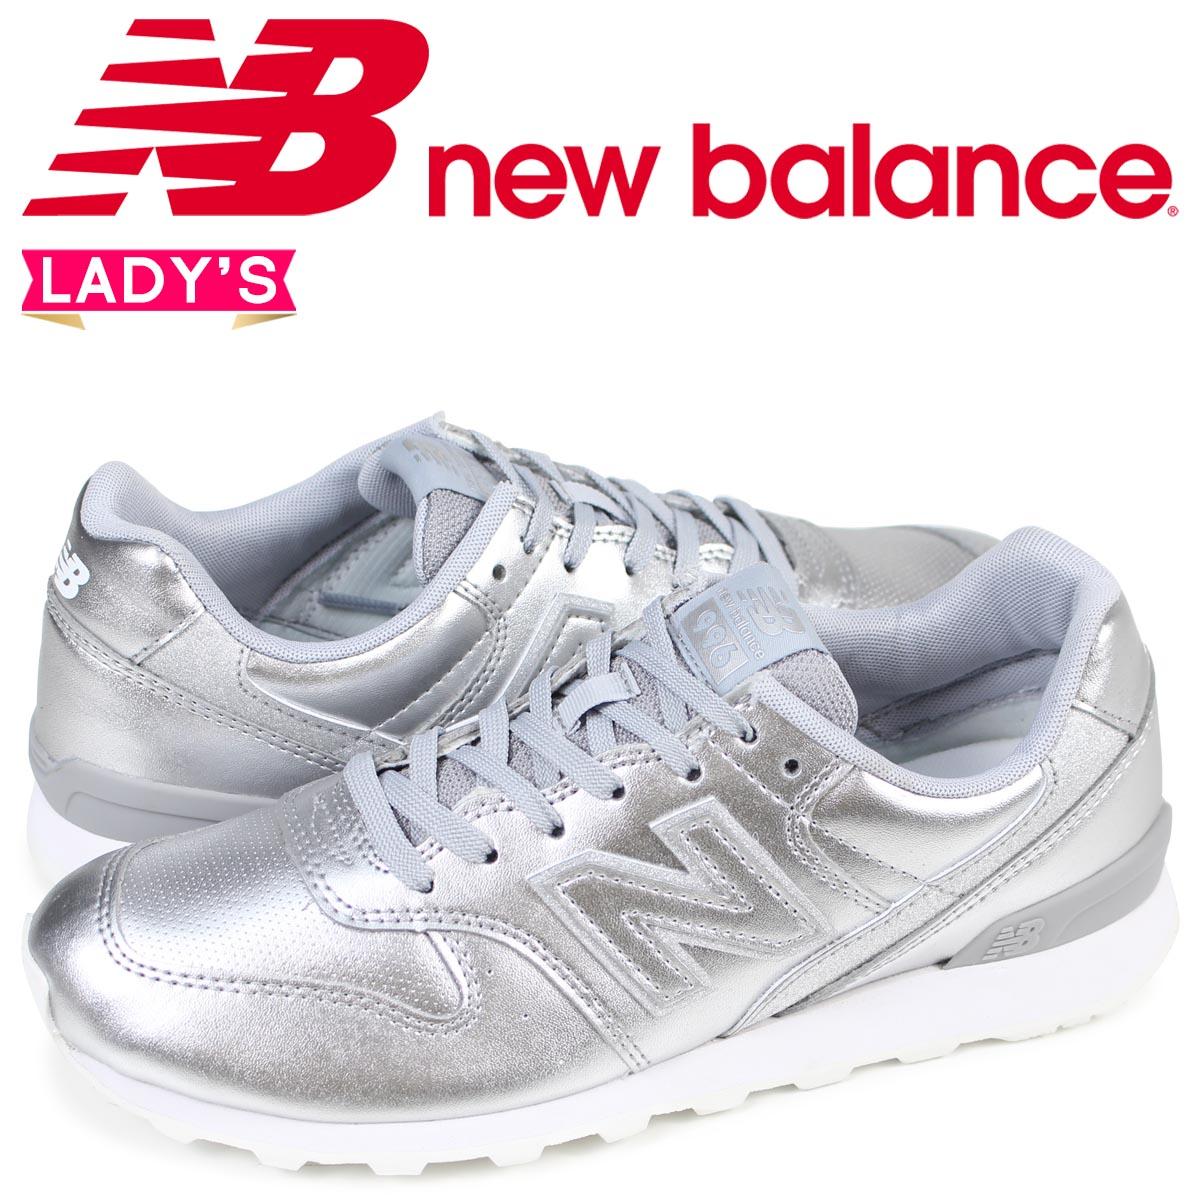 new balance wr996srs